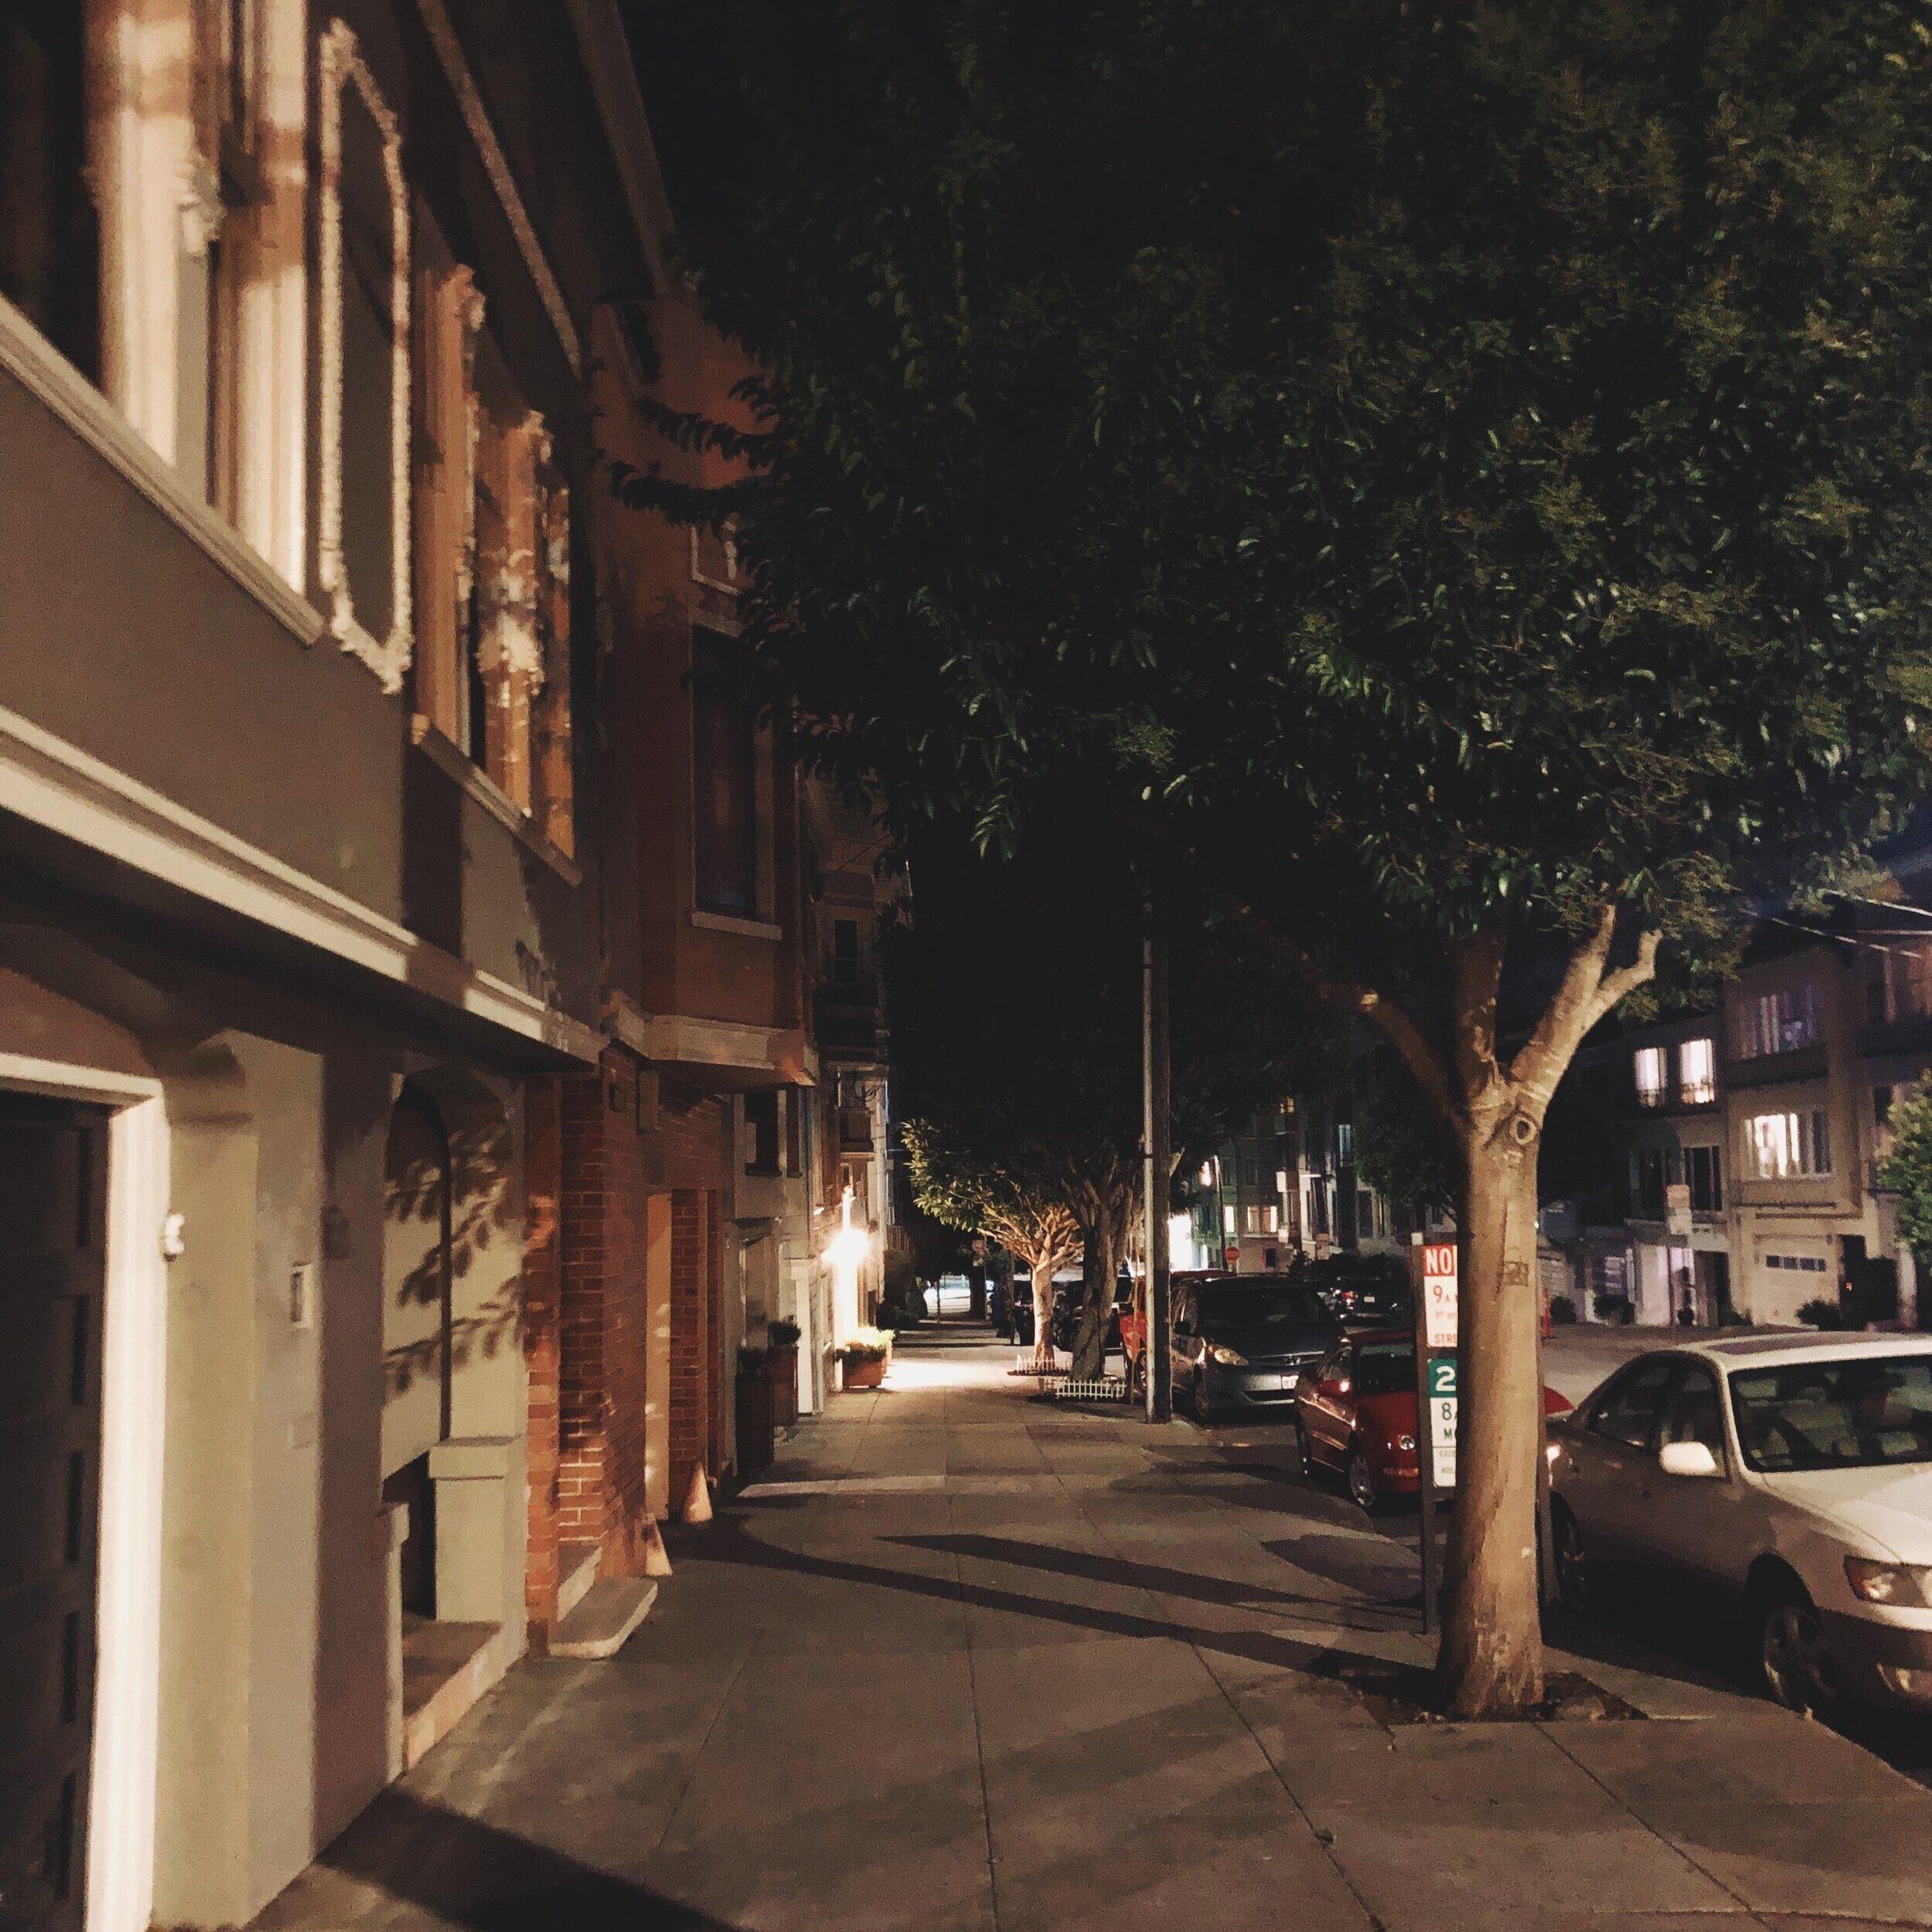 walking alone at night as a transman